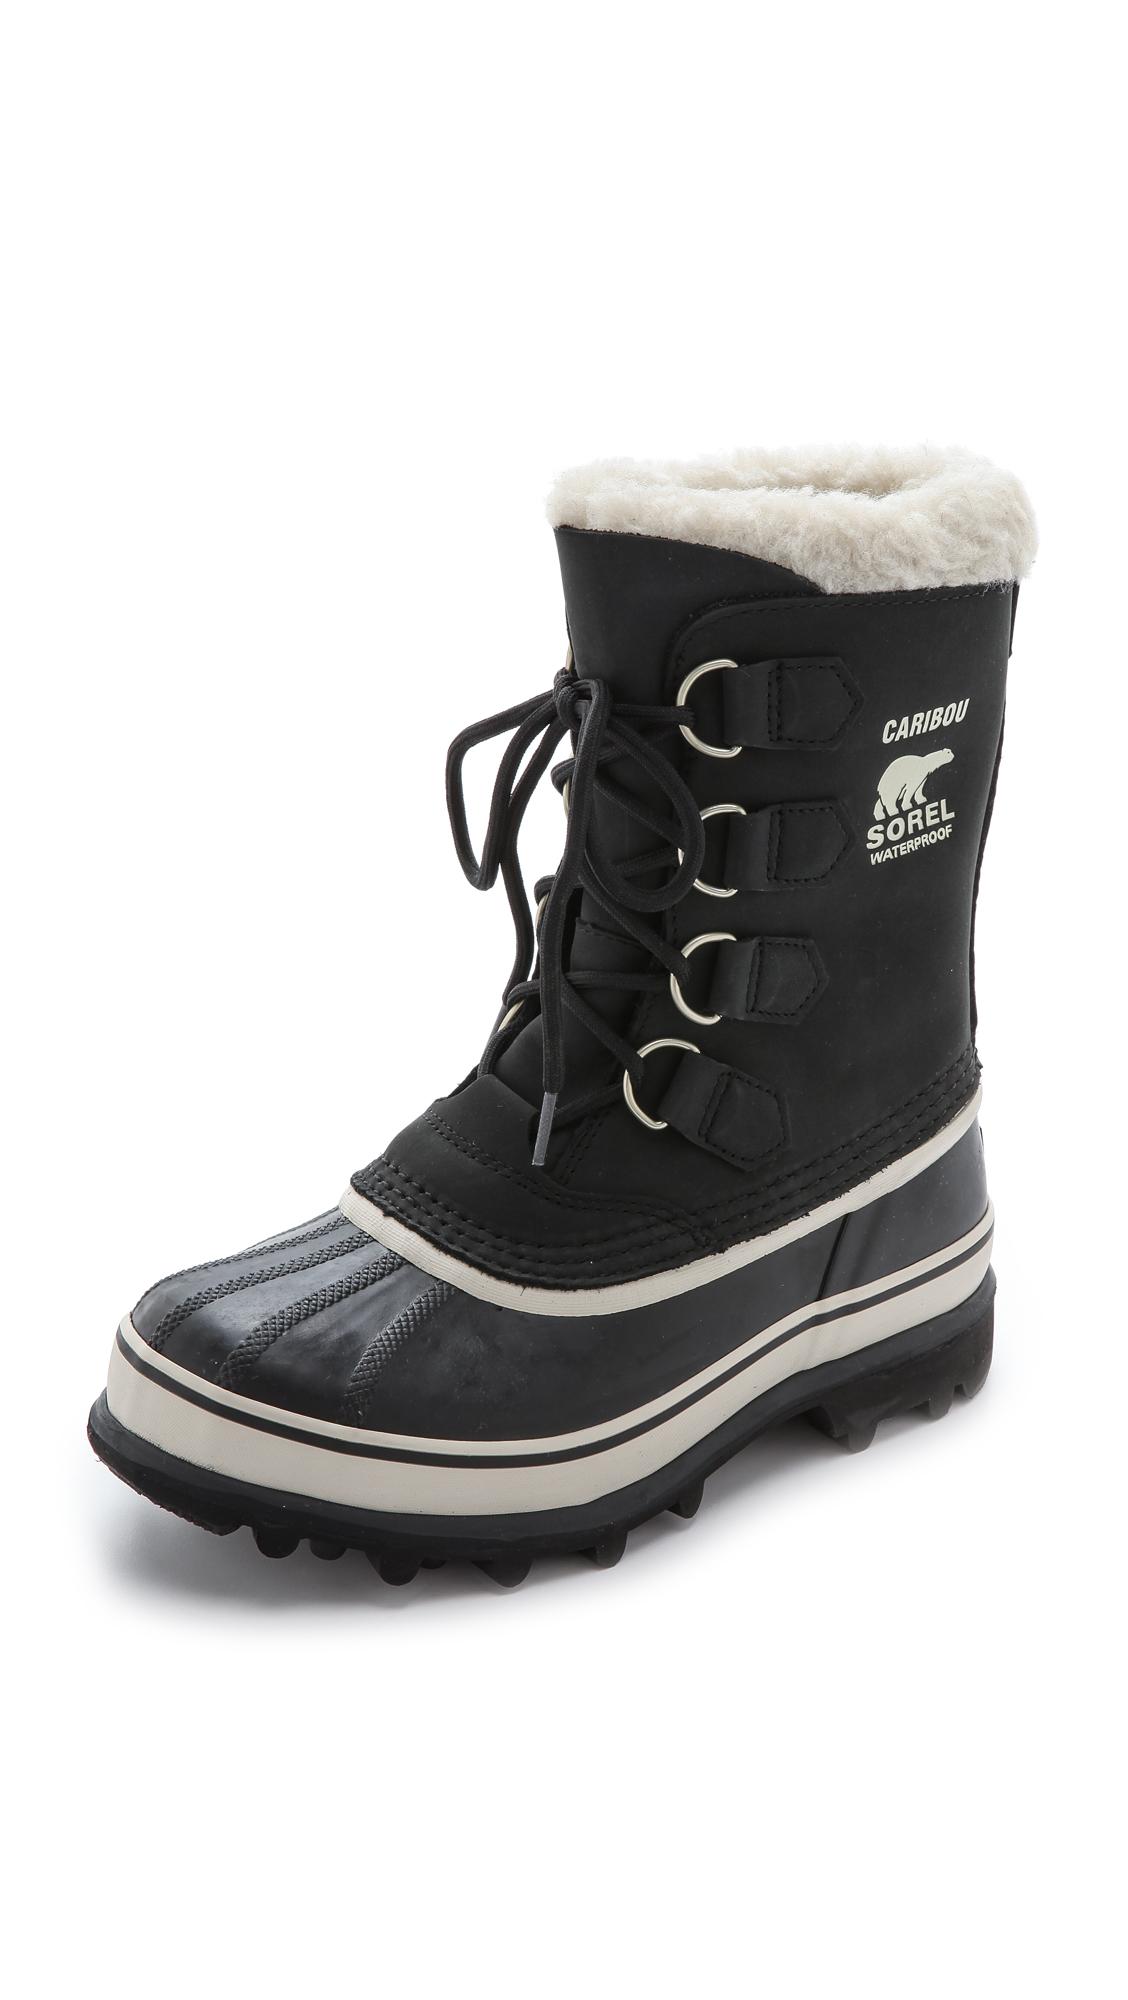 Sorel Caribou Boots - Black/Stone